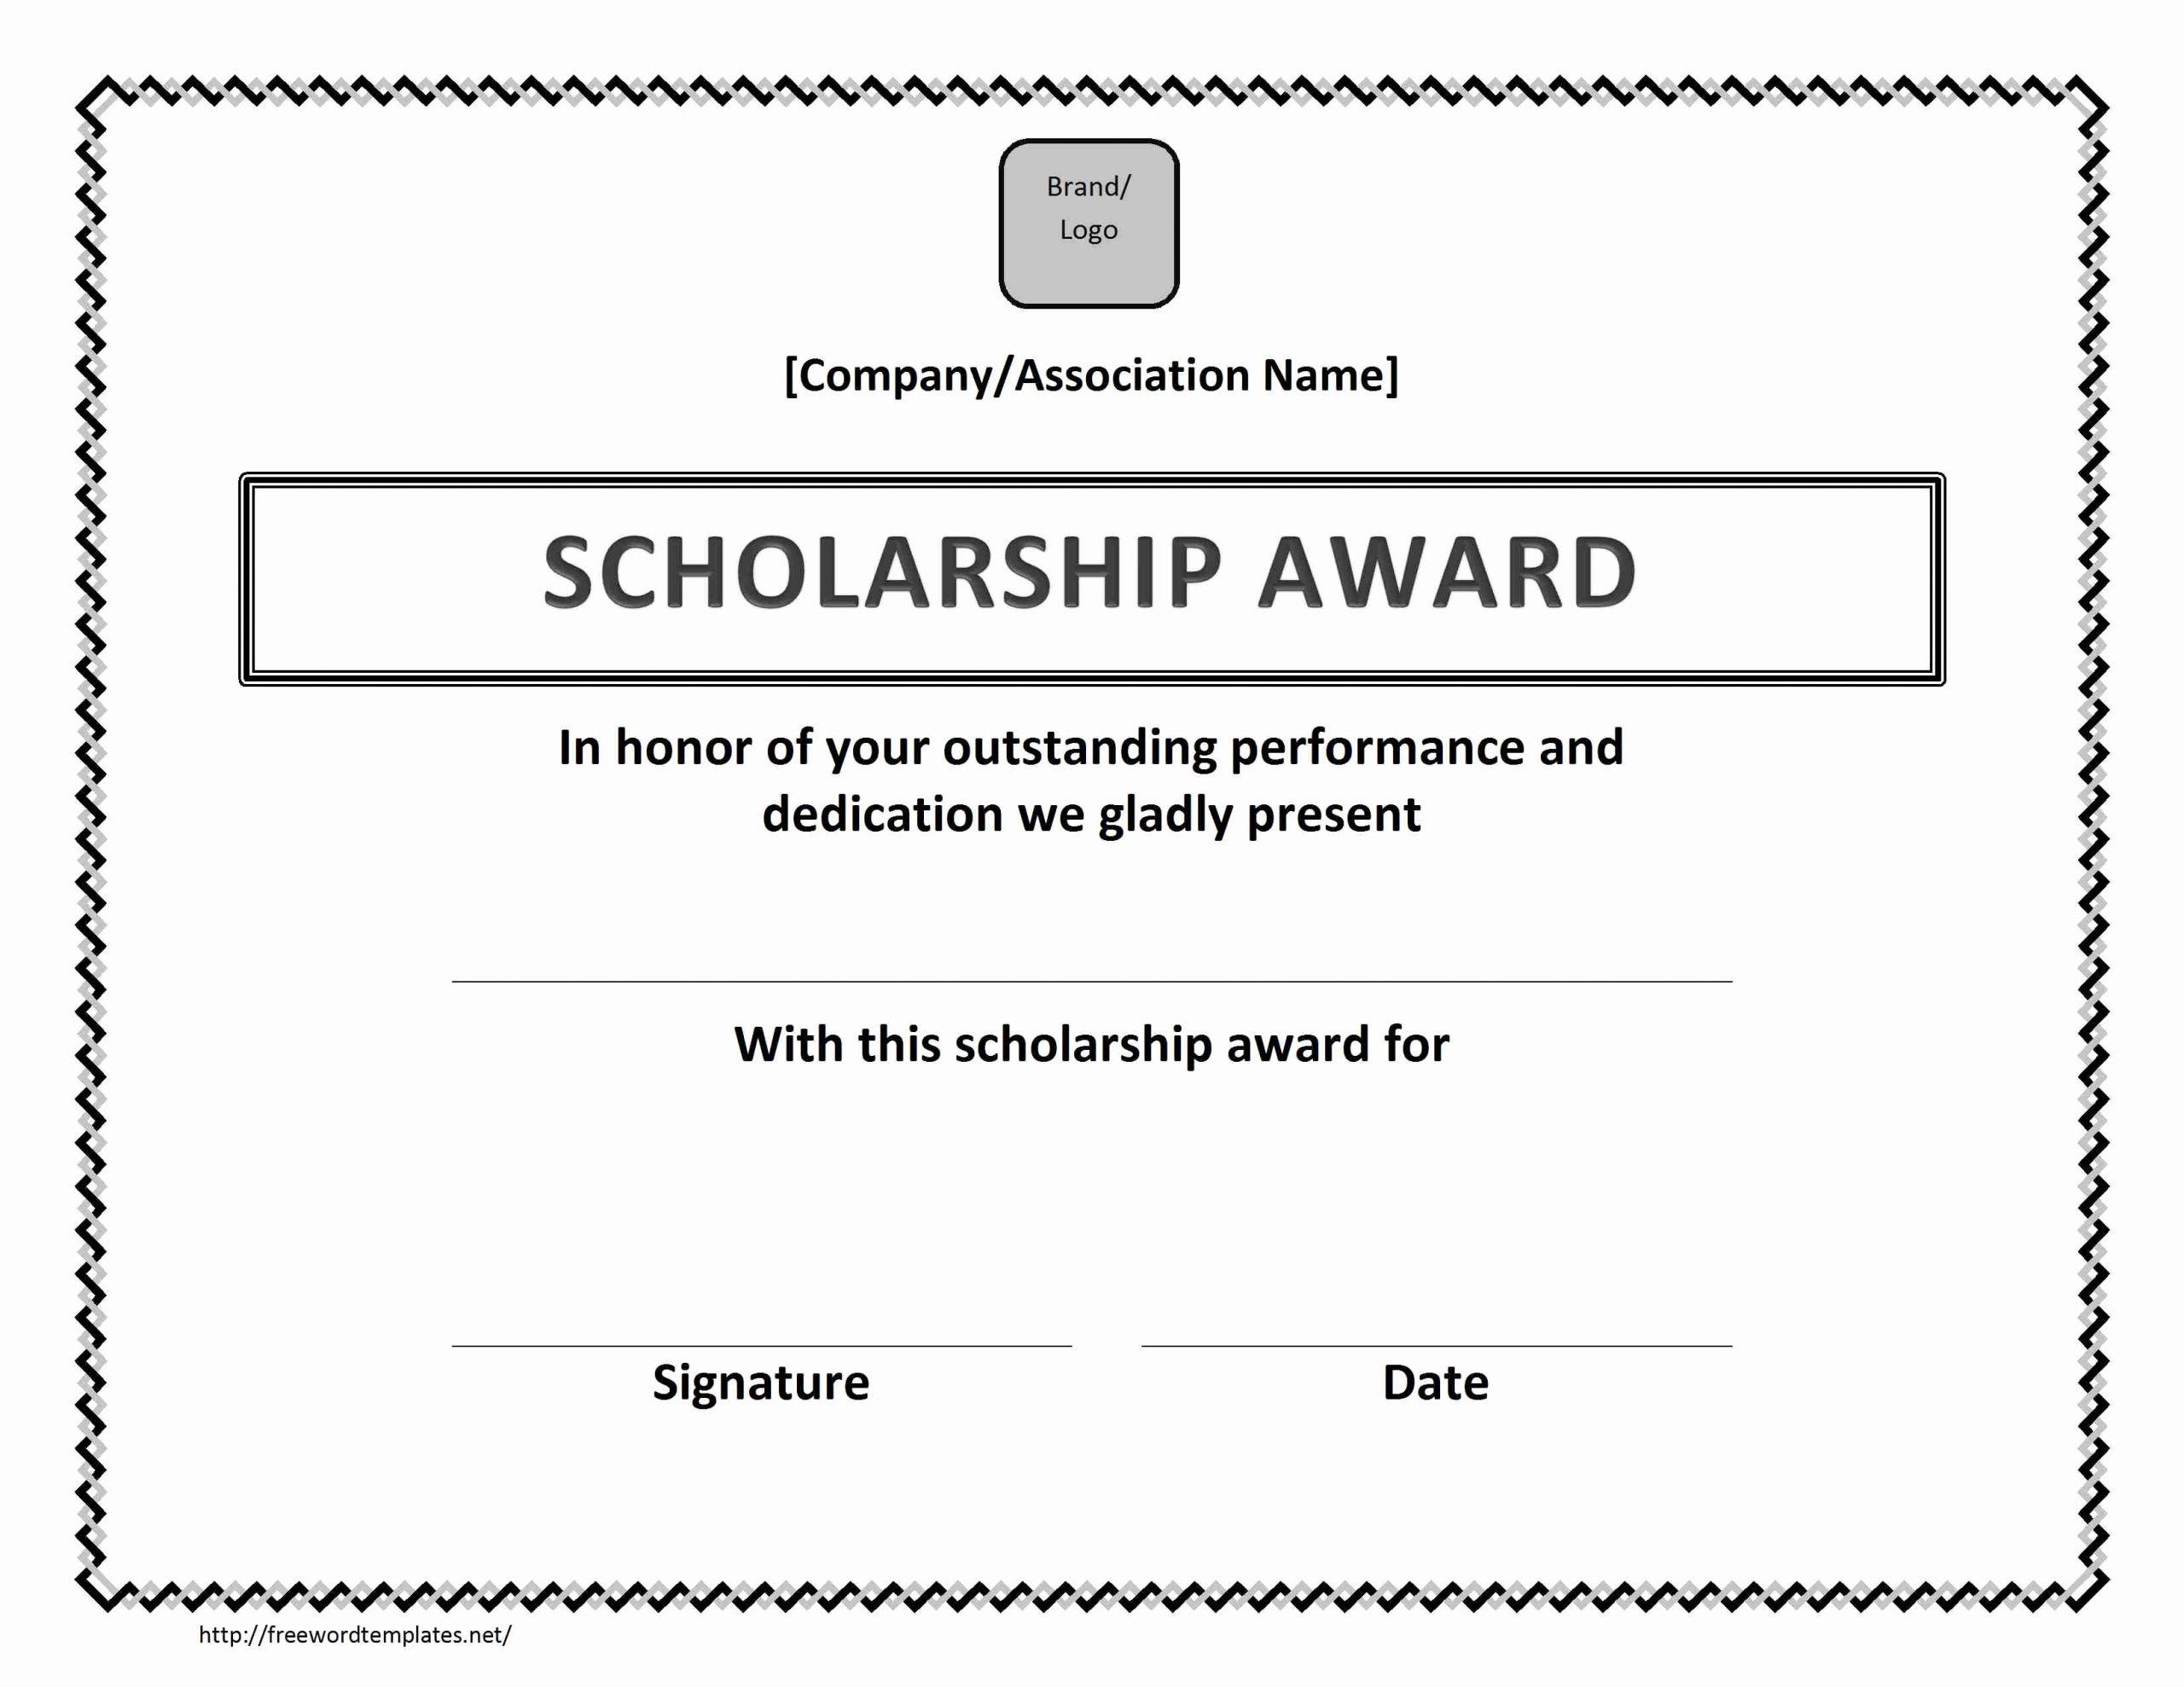 Awards Certificate Template Google Docs Best Of Scholarship Award Certificate